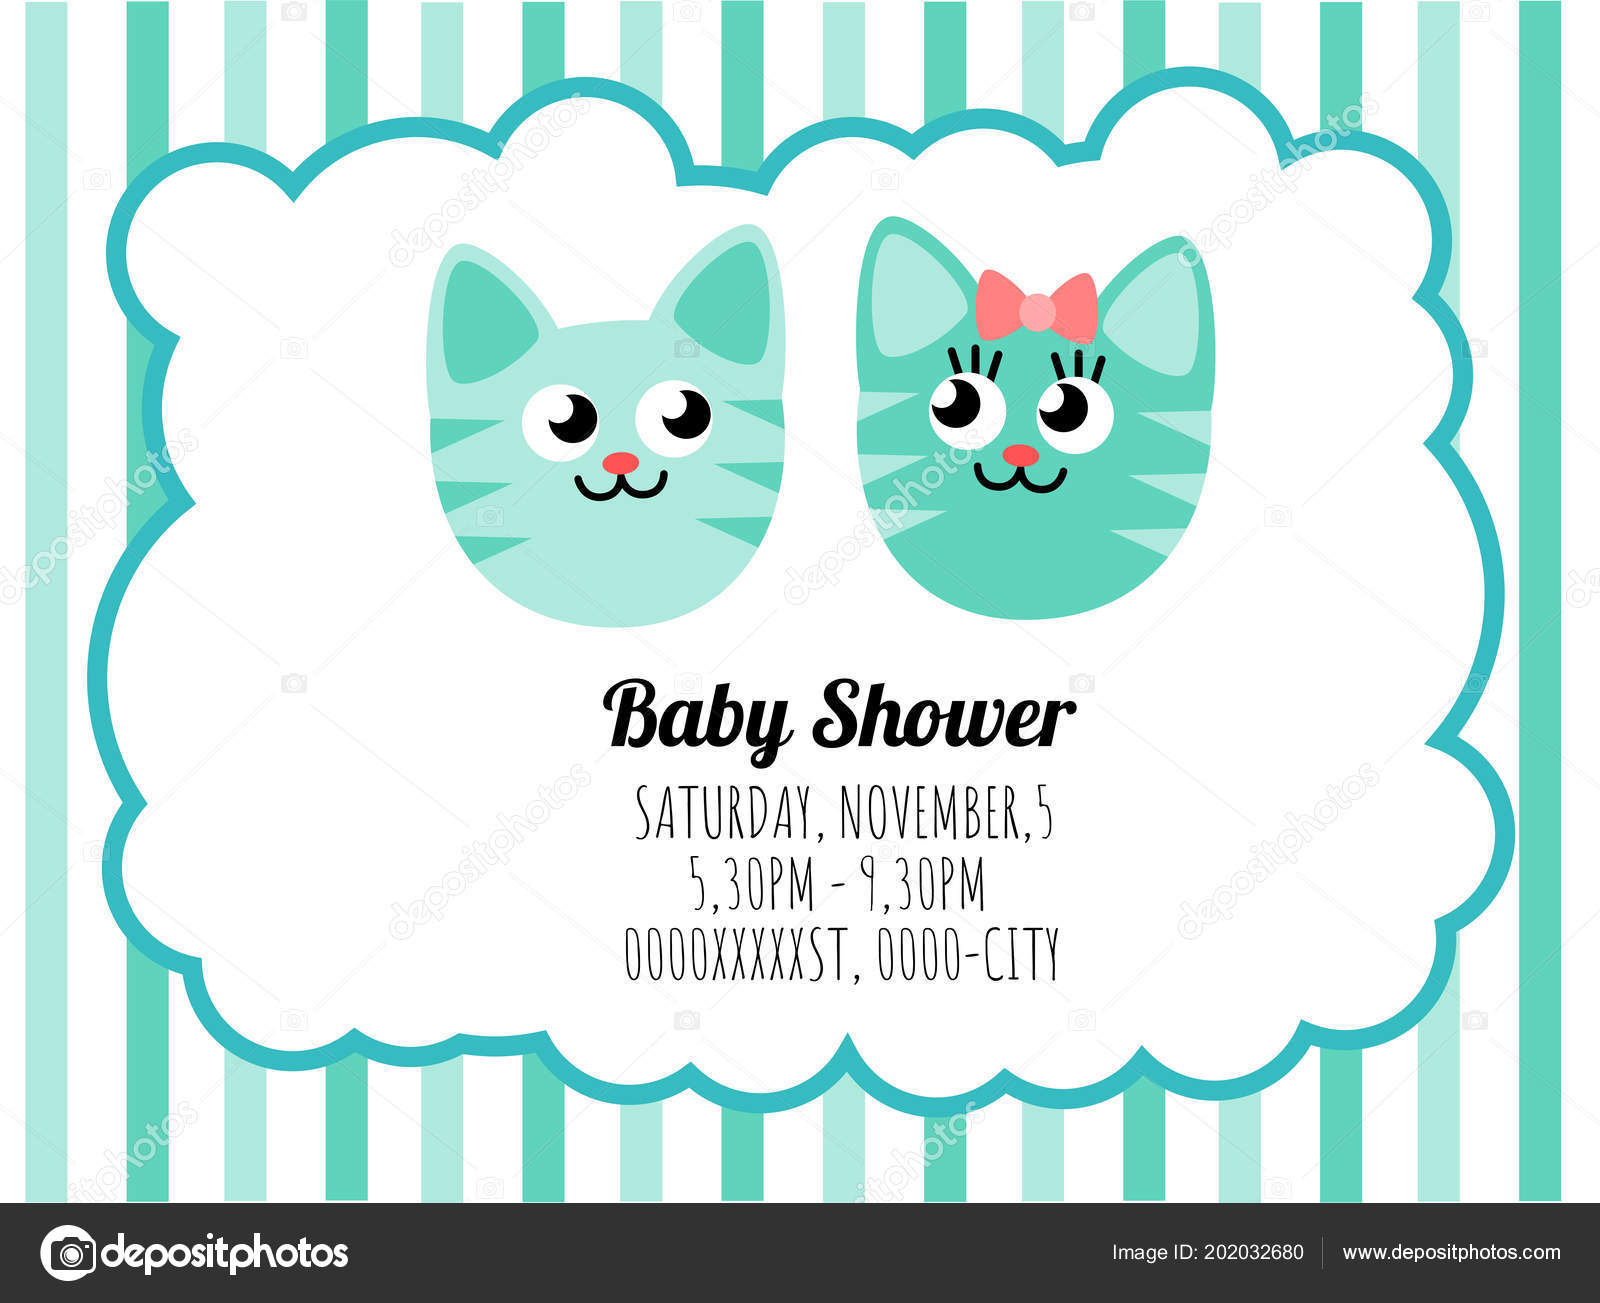 Pretty Template Card Invitation Baby Shower Image Vectorielle